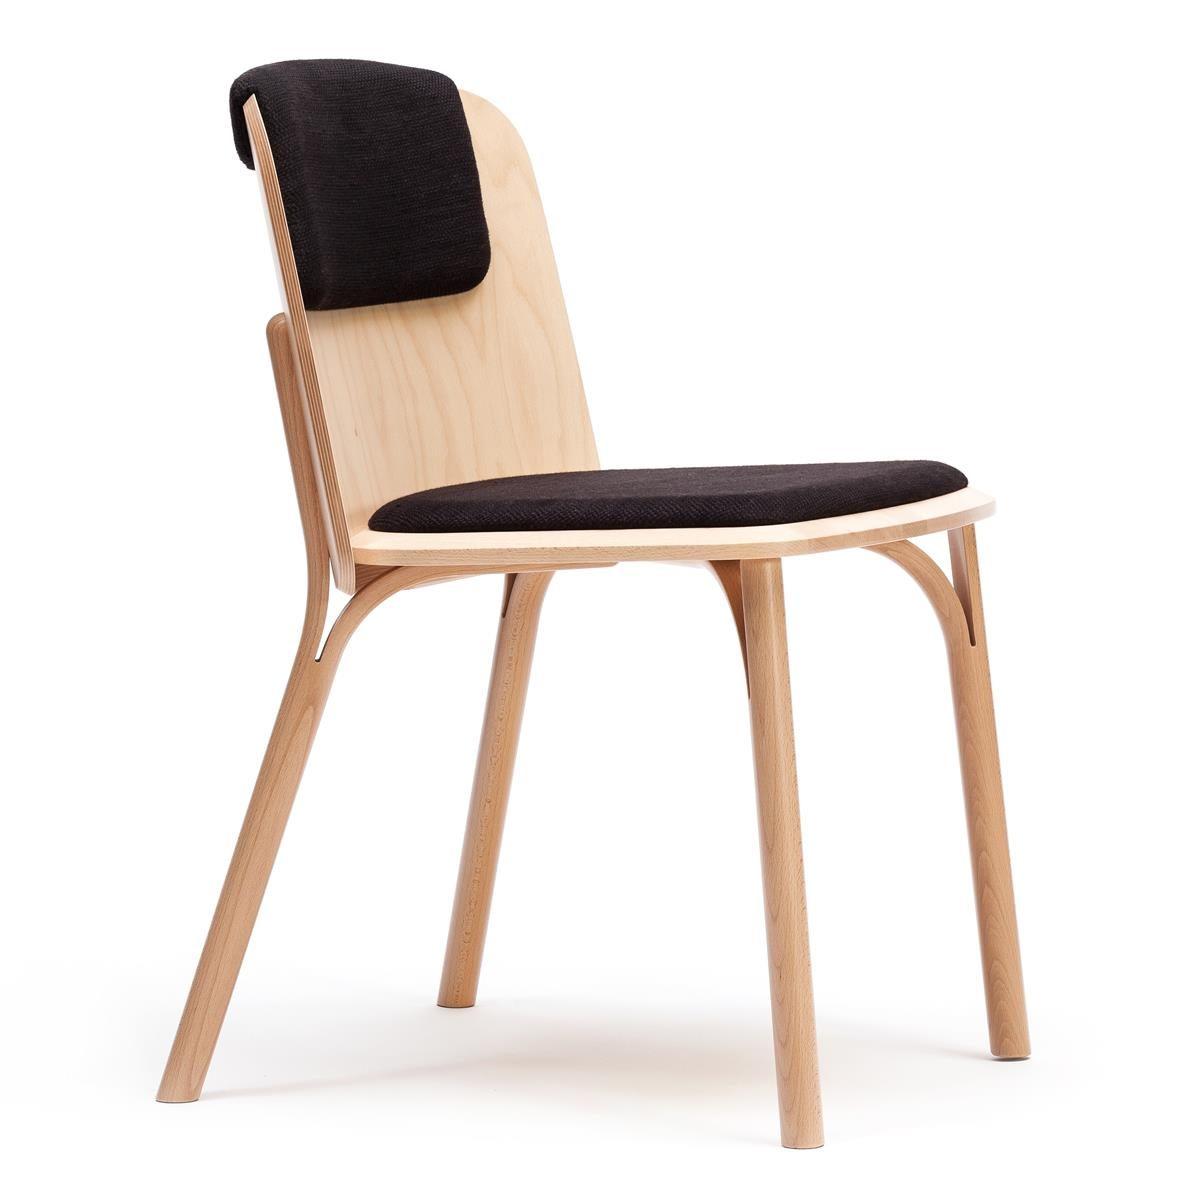 scaun lemn masiv